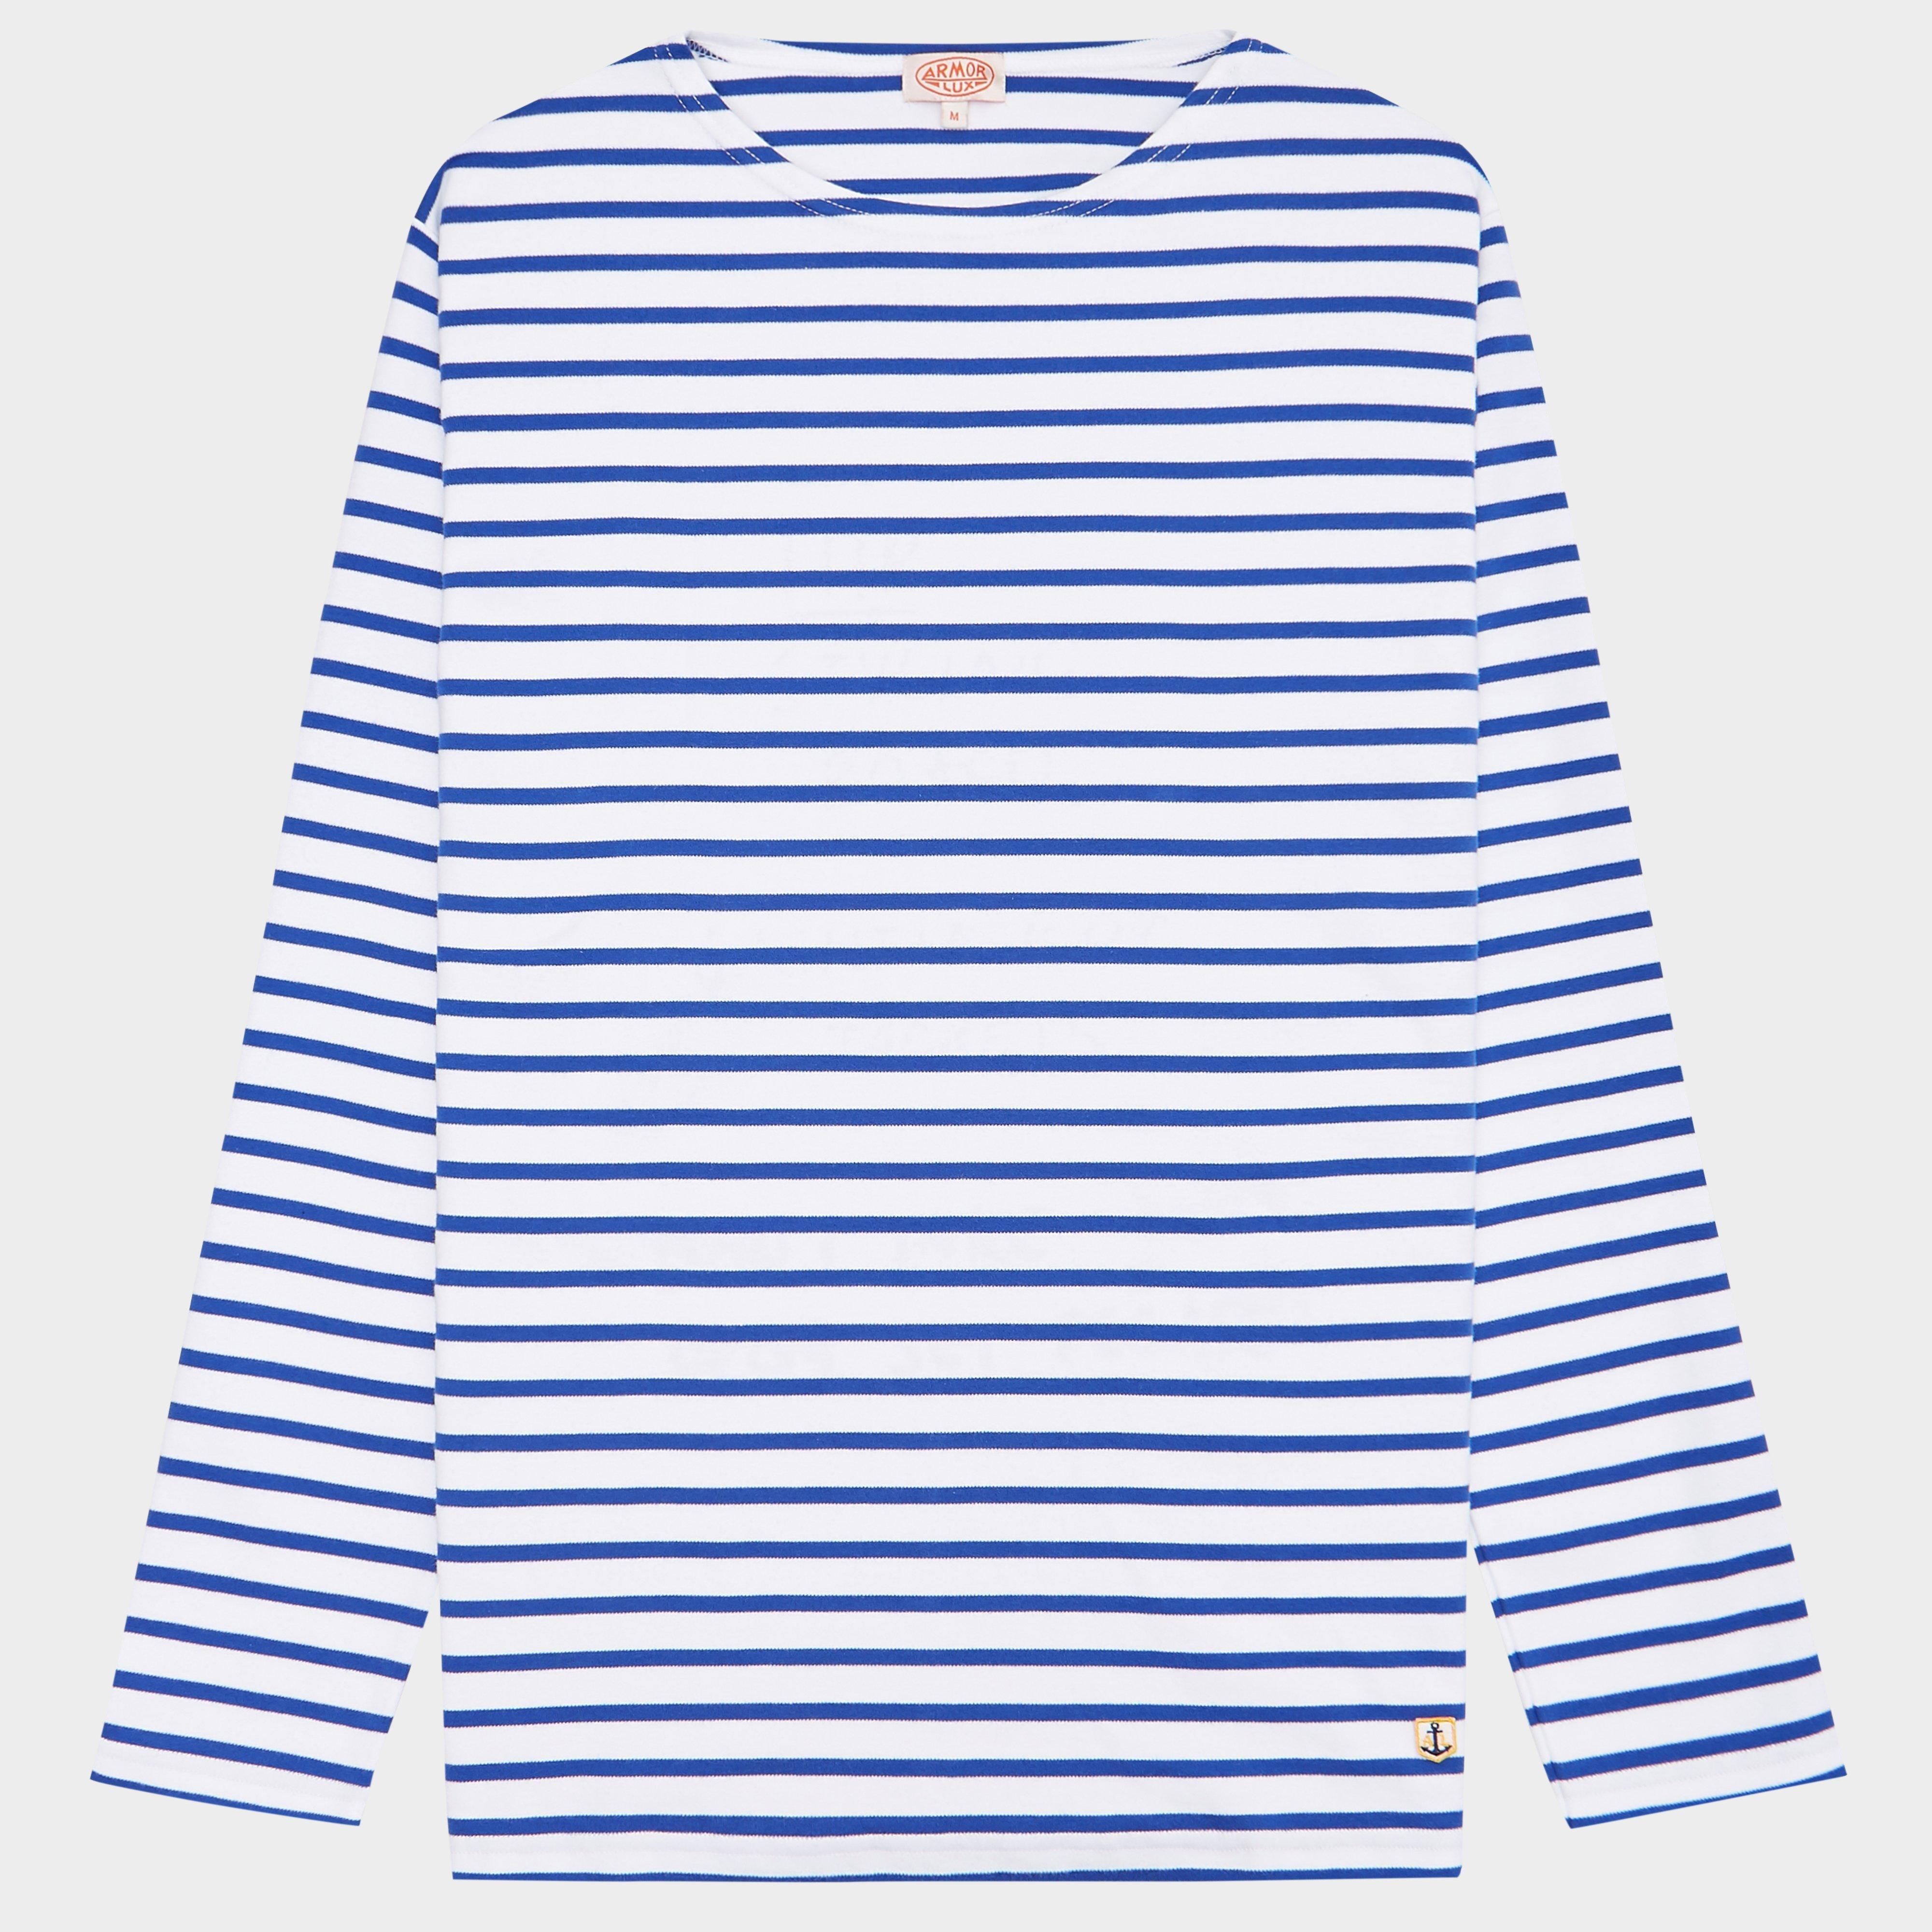 Armor Lux 02297 Long Sleeved Breton T-shirt